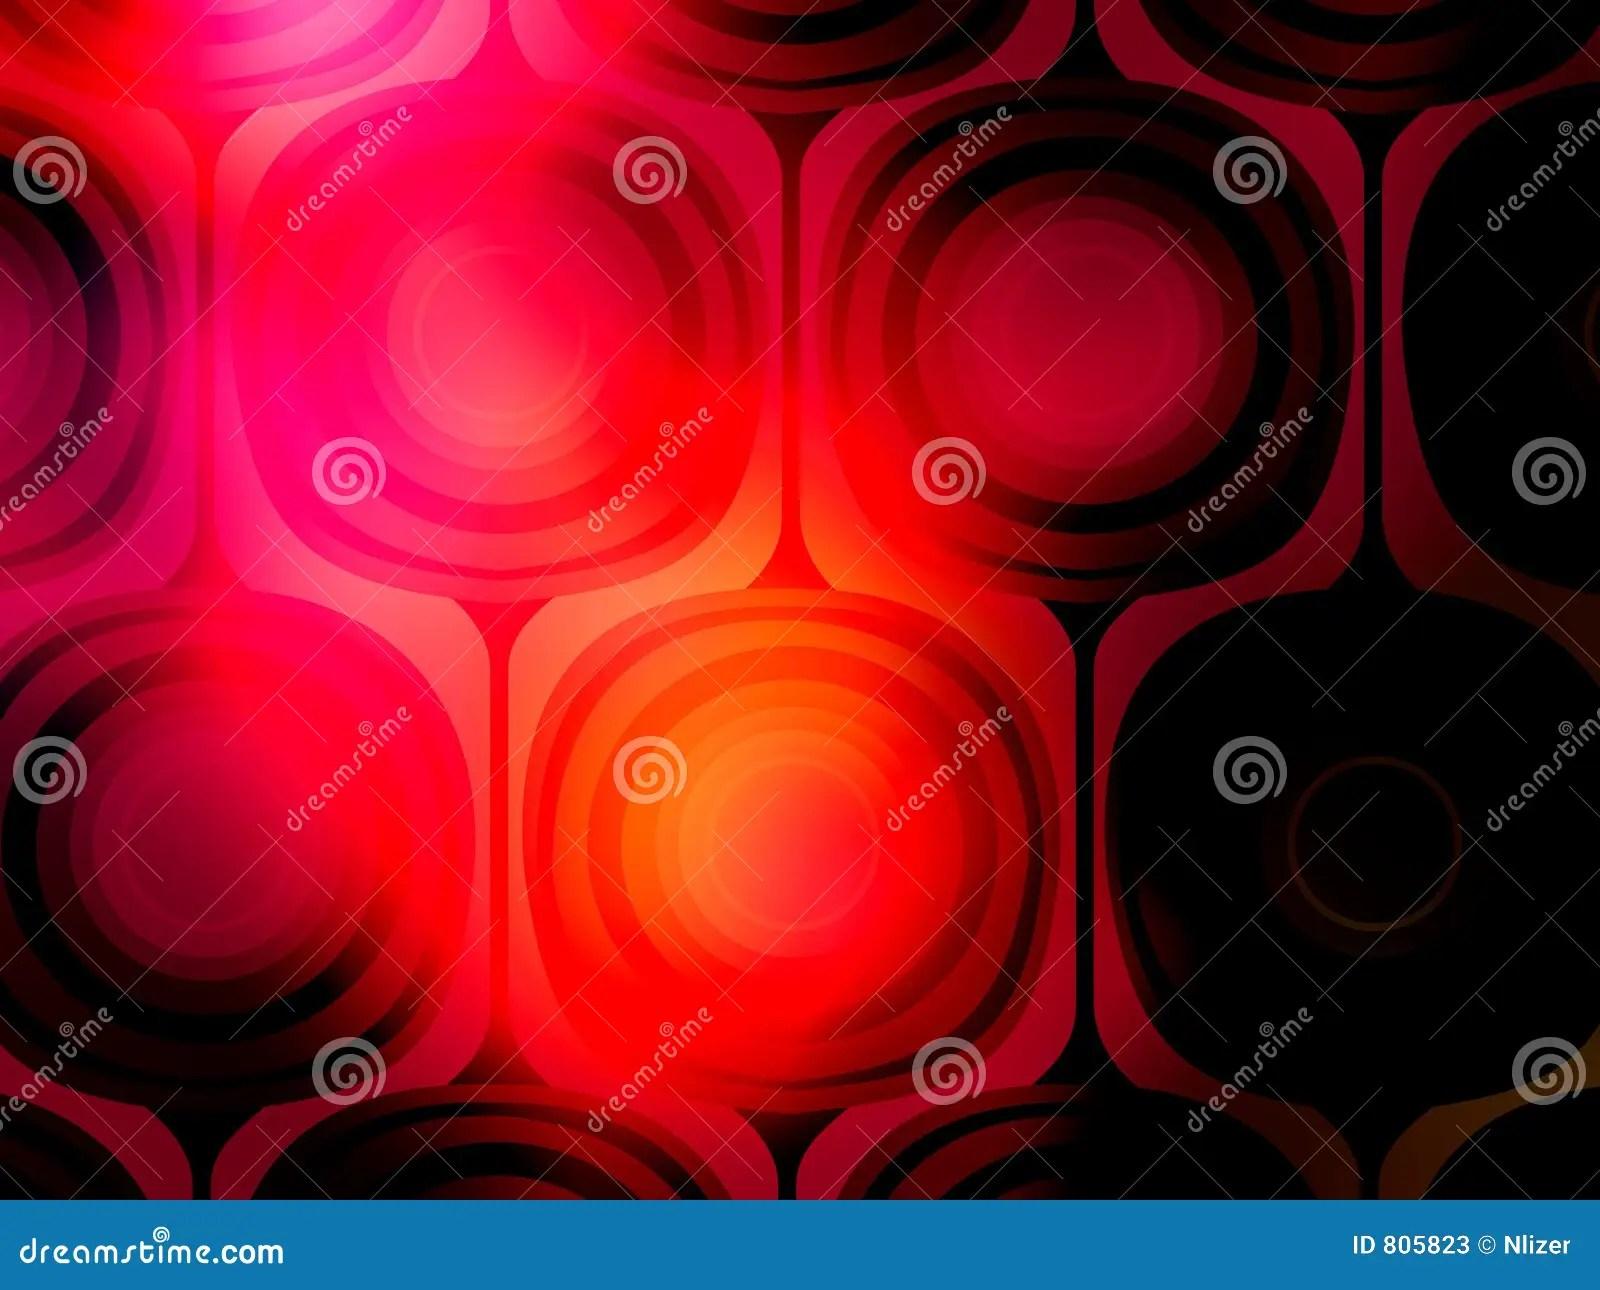 3d Xmas Wallpaper Free Vibrant Red Black Mod Background Wallpaper Stock Photos